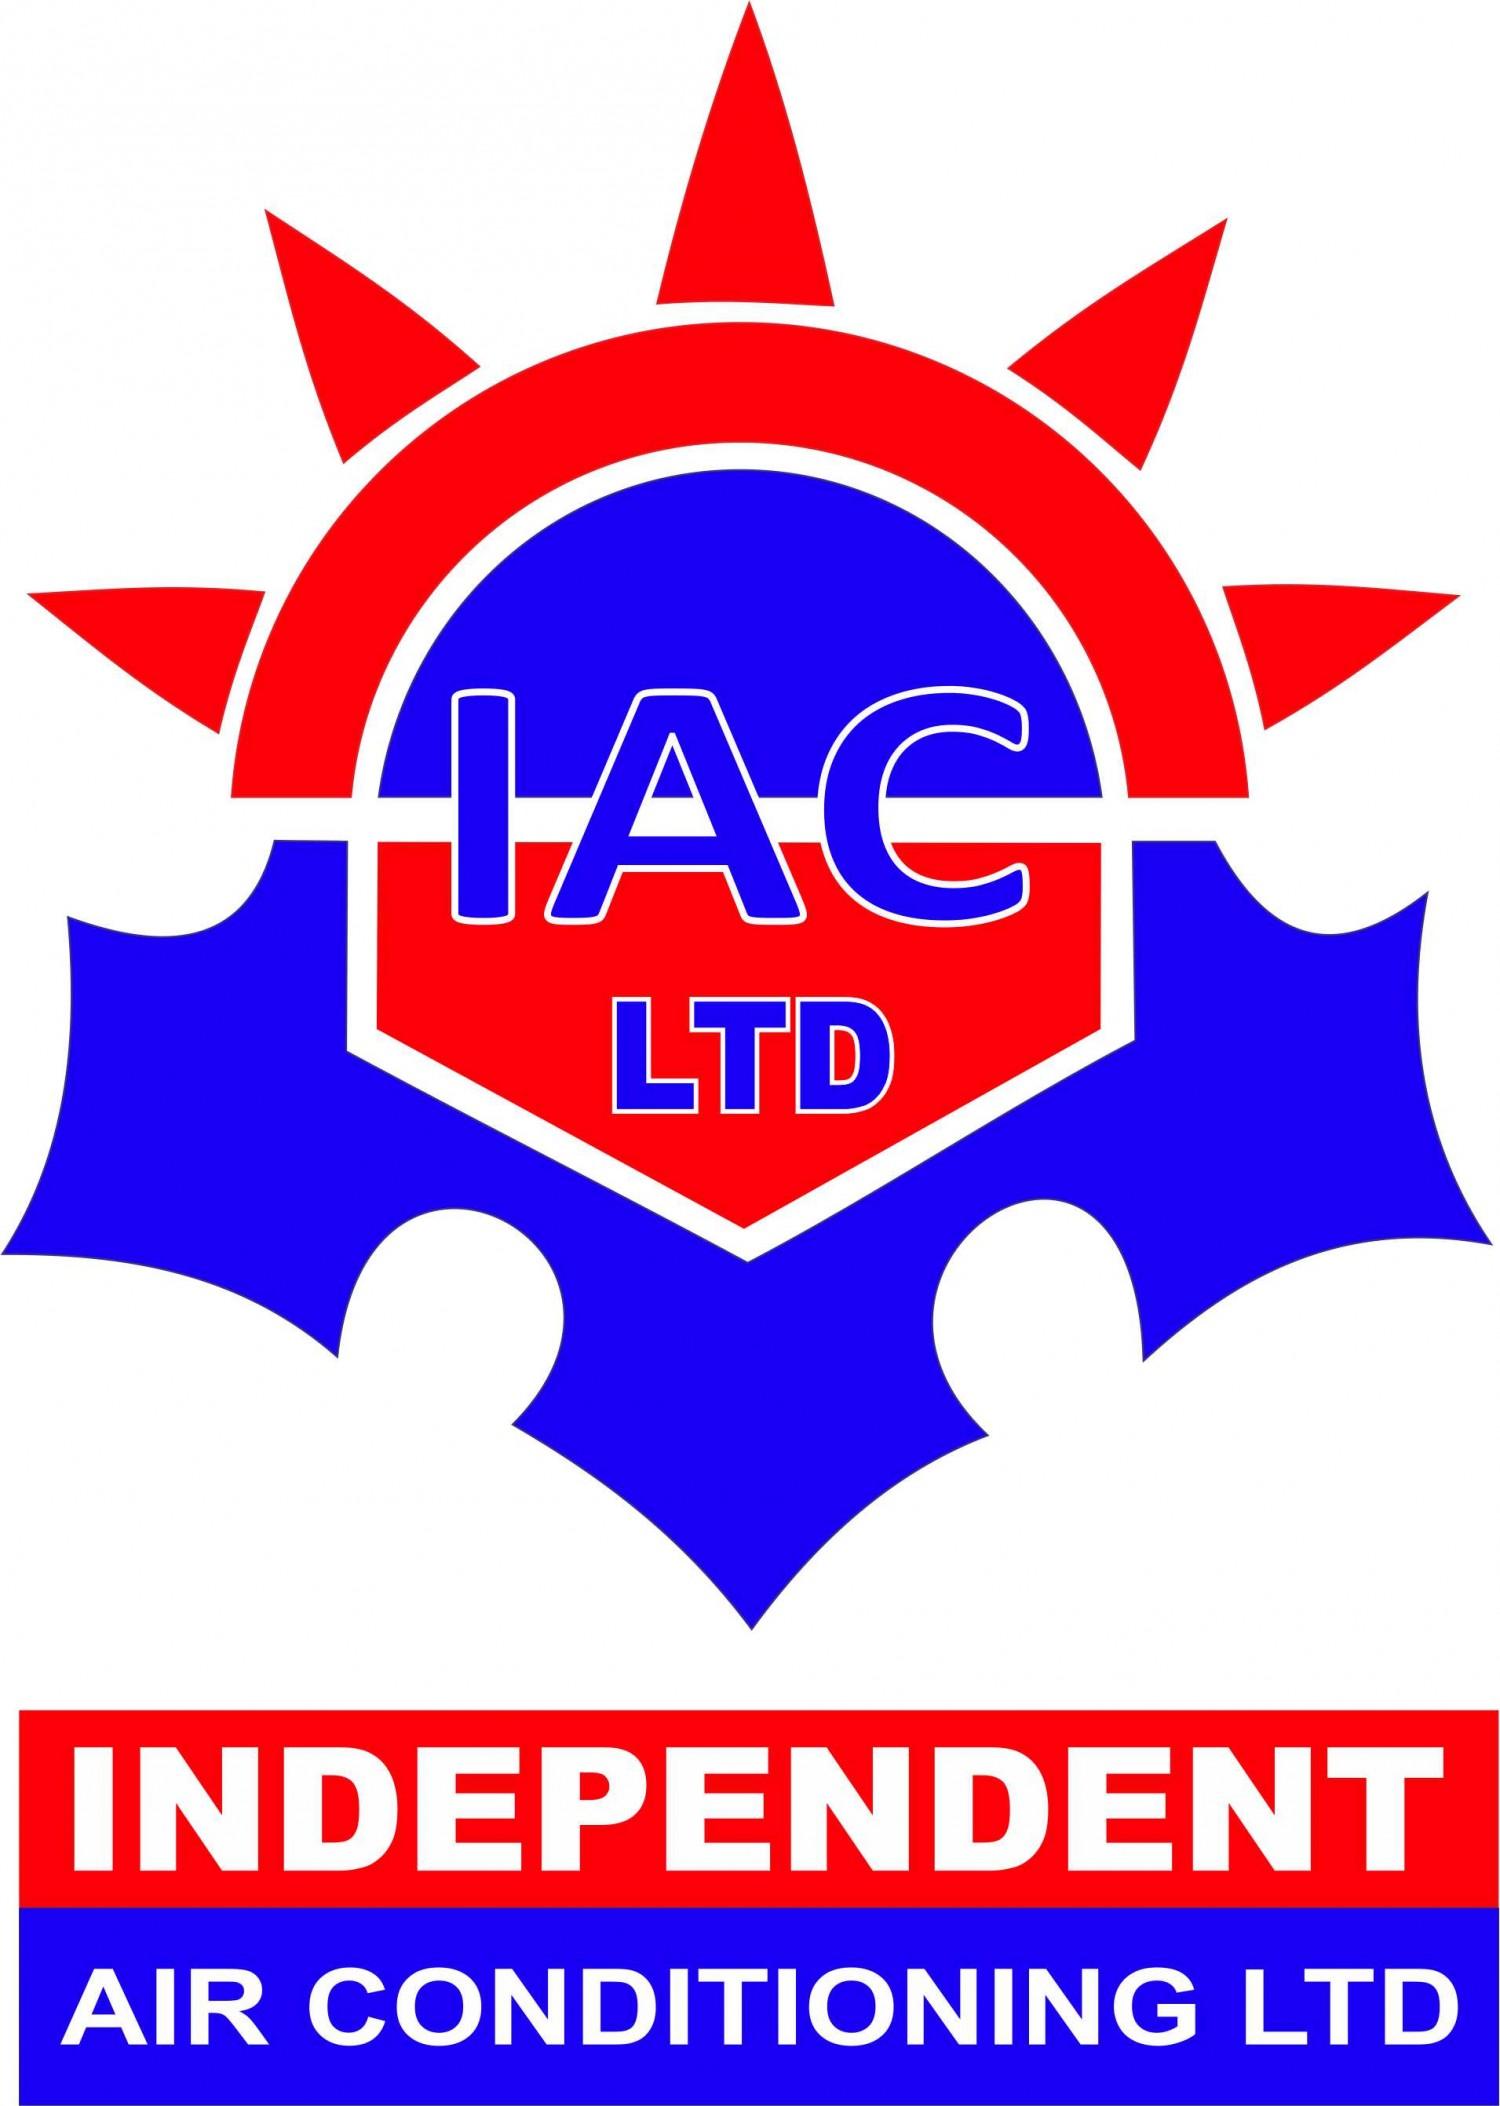 IAC new logo